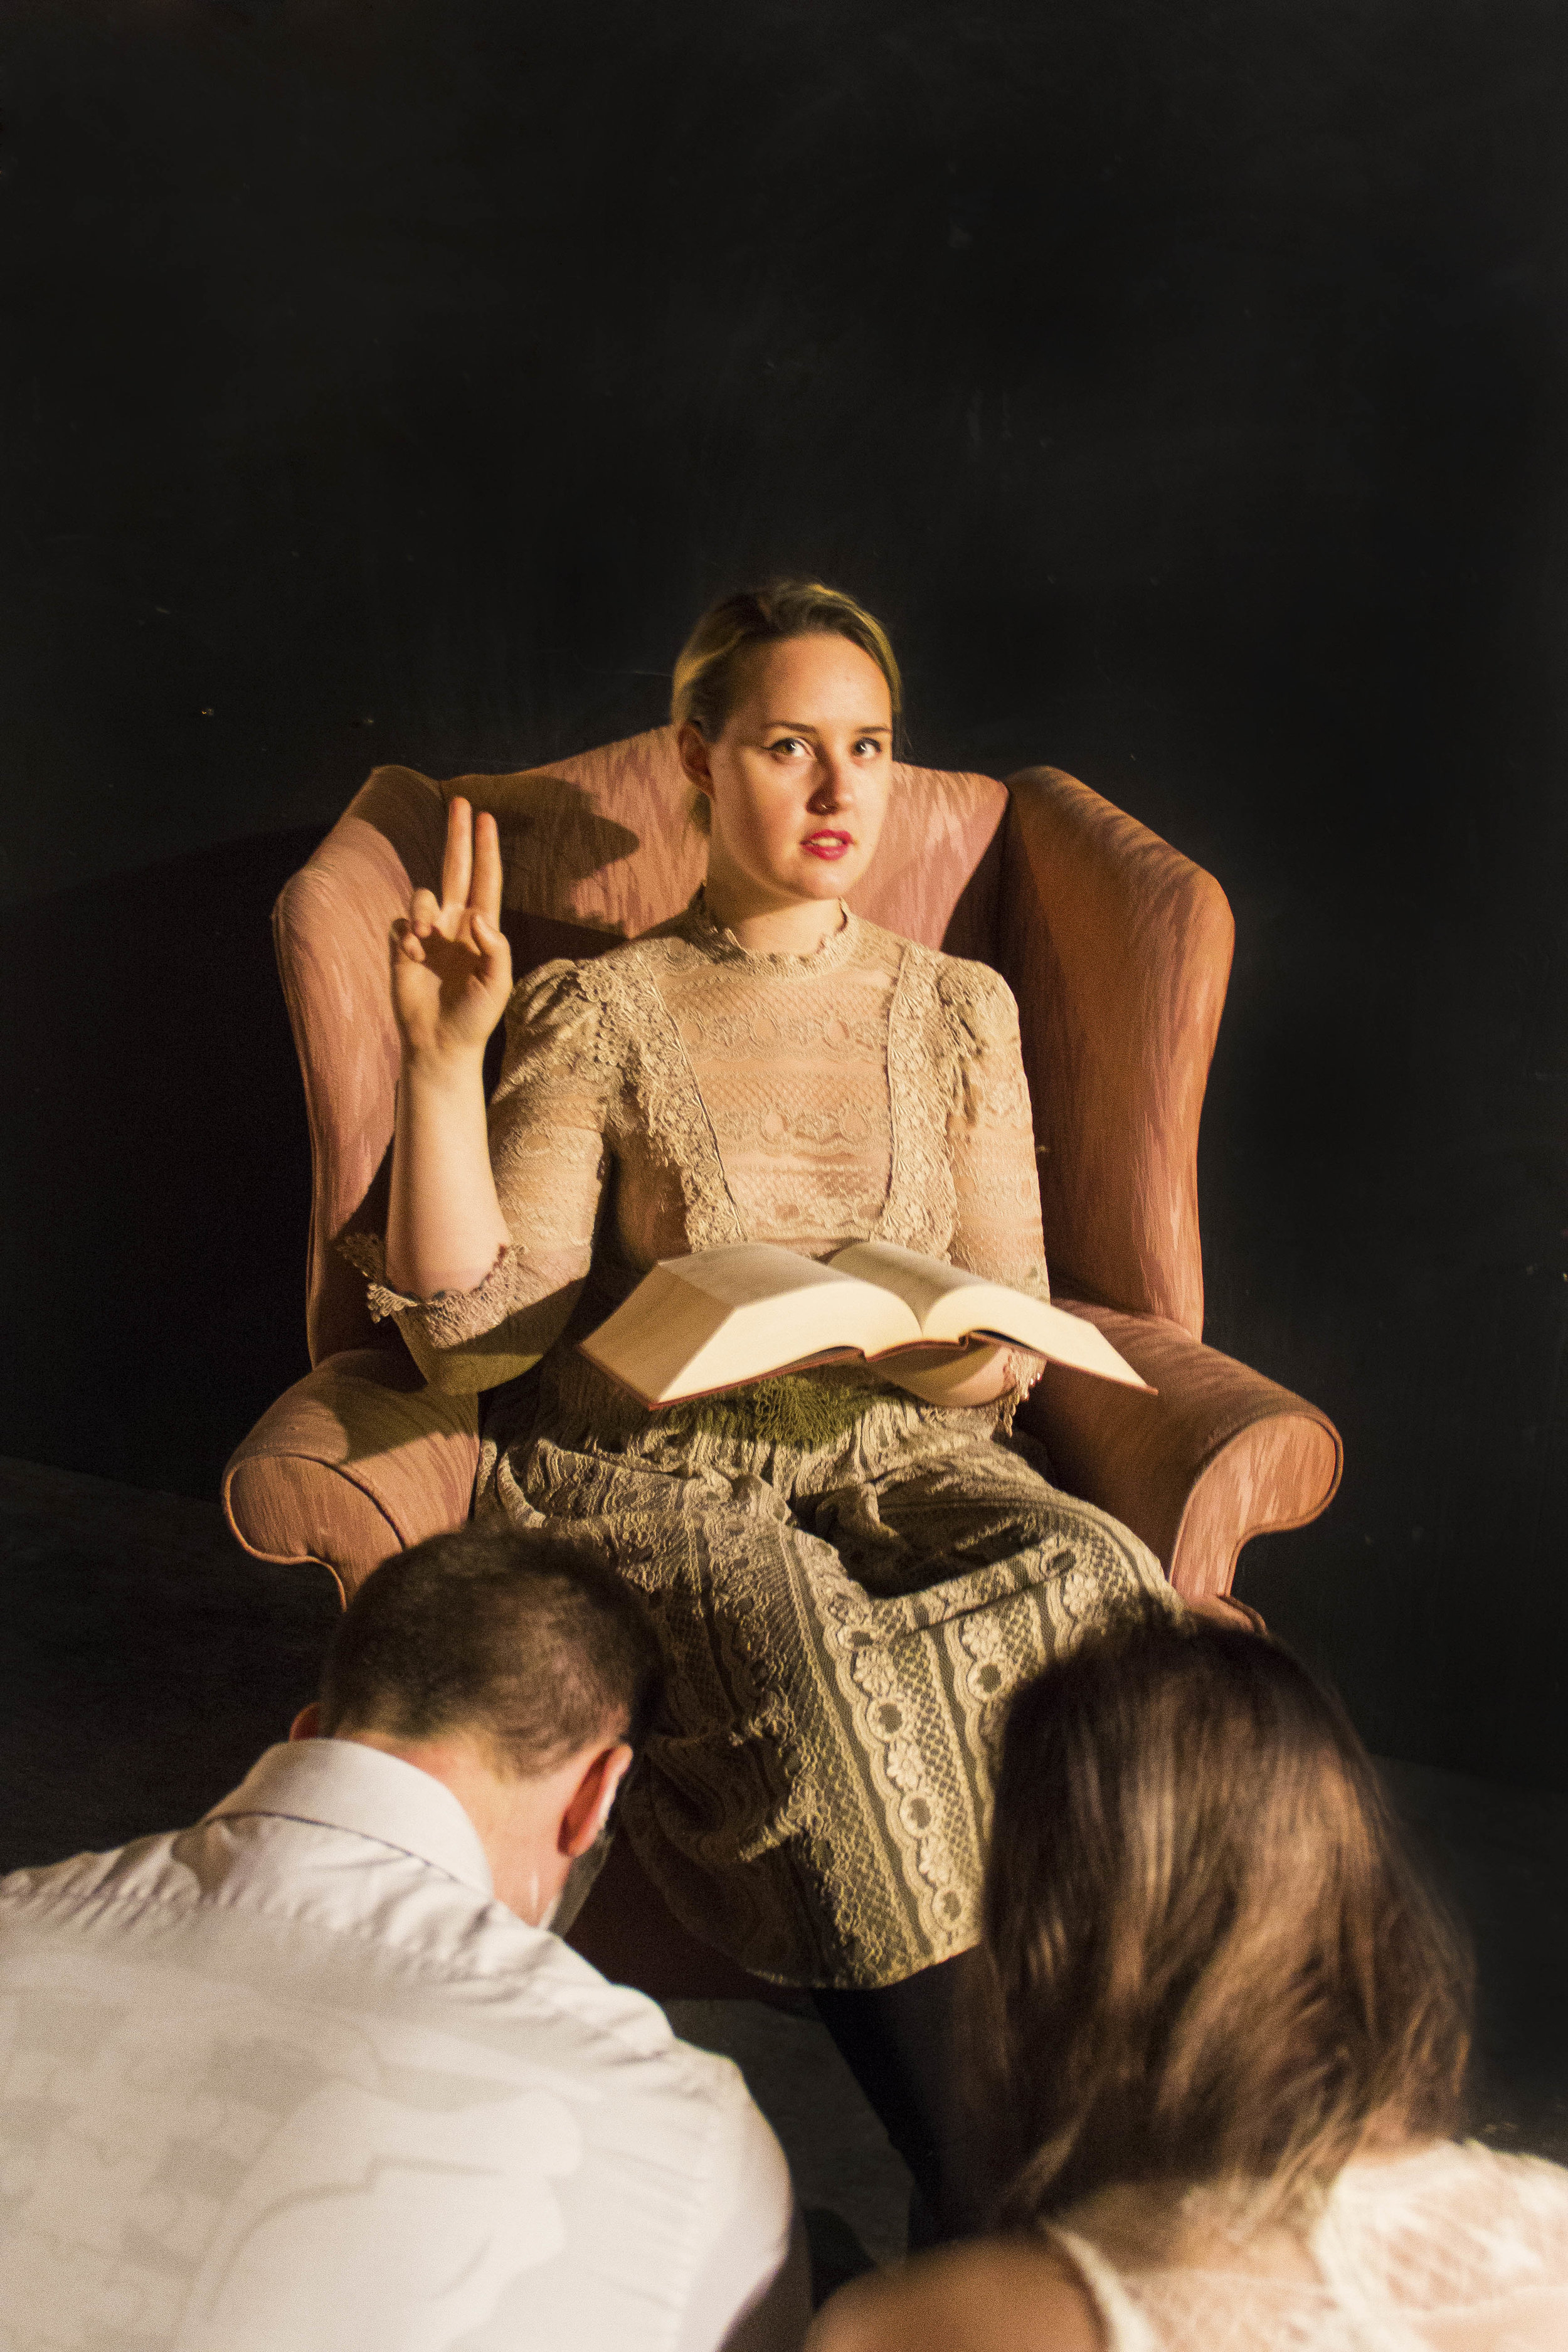 Co-Owner Melissa Madara and novitiates Cooper Wilhelm & Gigi Mead as The Hierophant